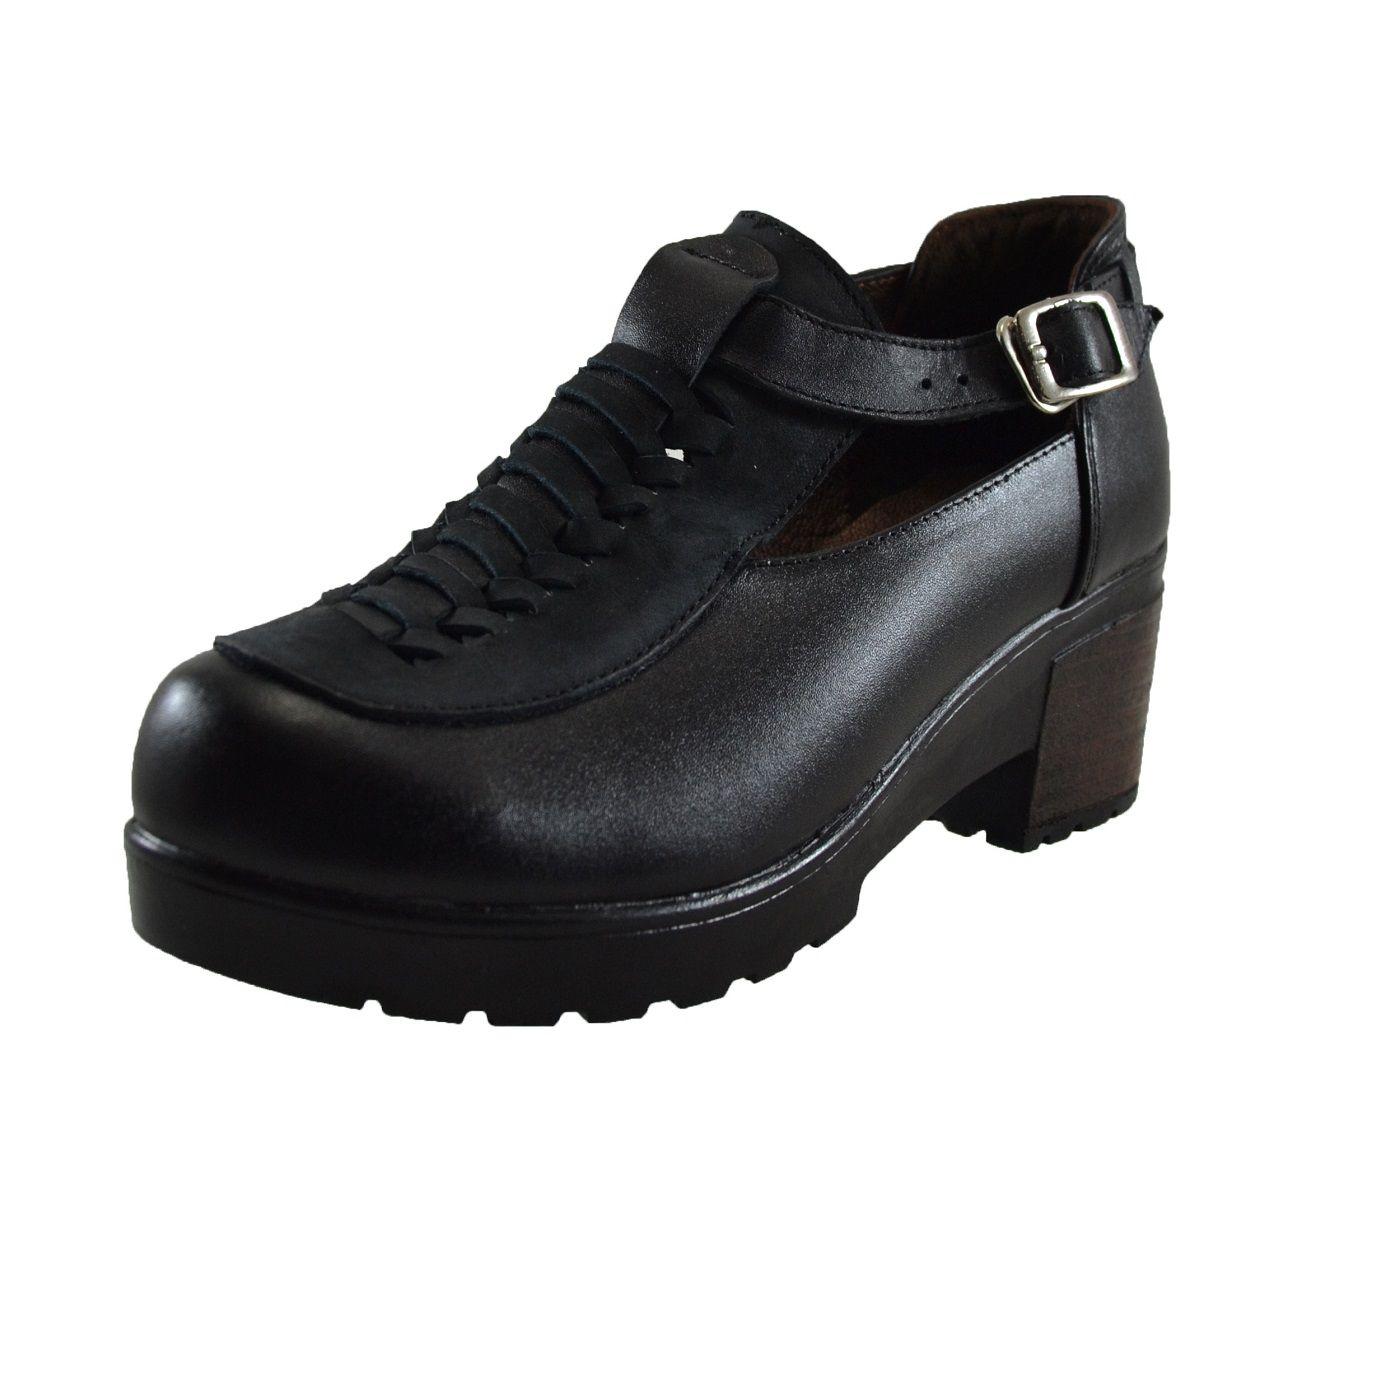 کفش زنانه کد 461 -  - 1